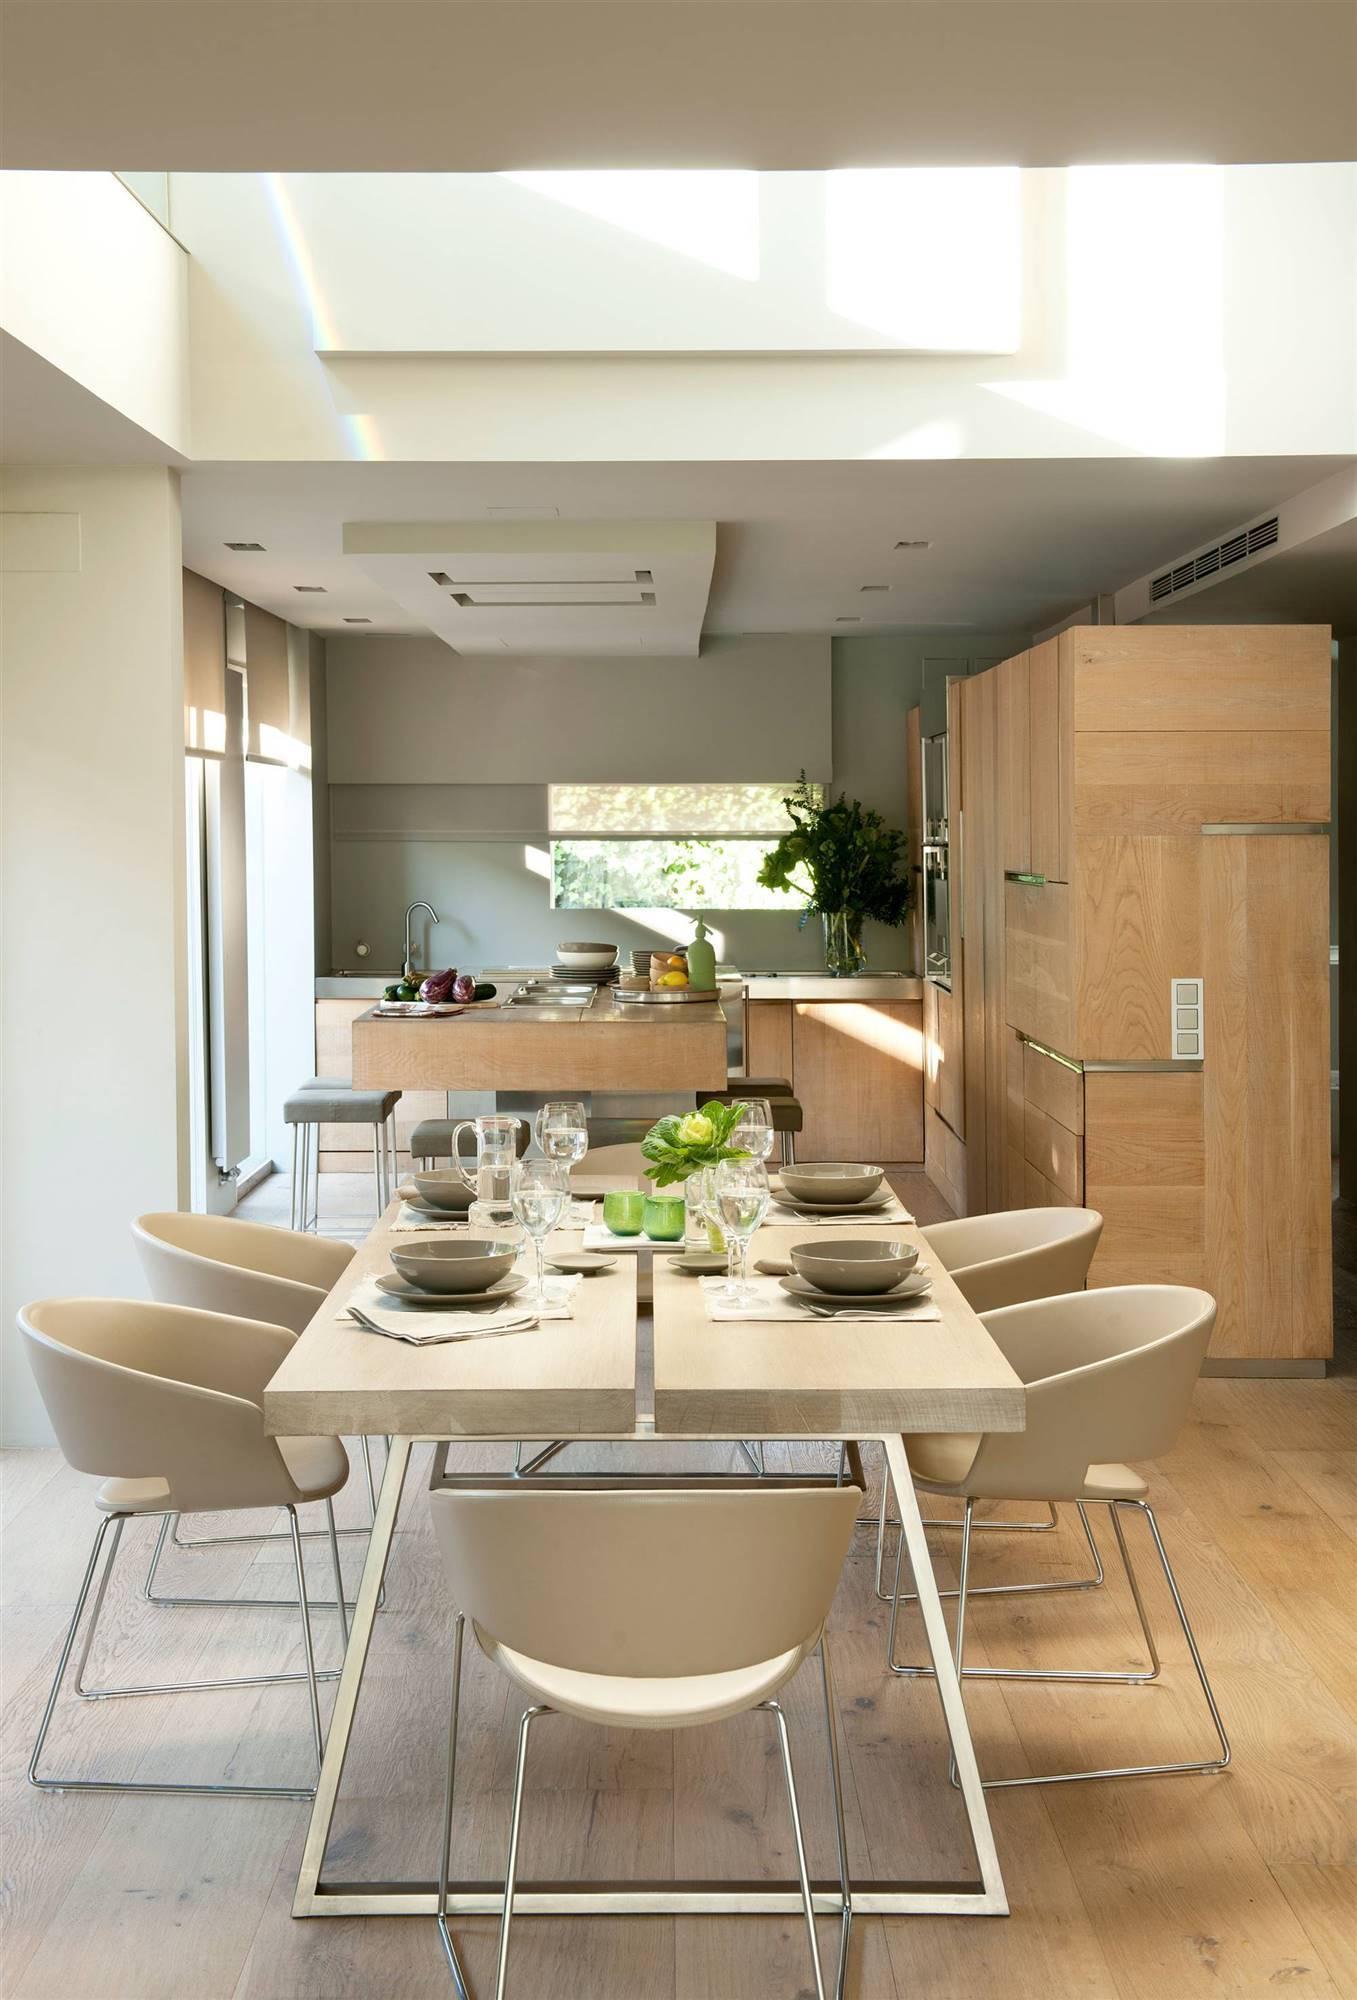 modern-wooden-kitchen 00396318-o 199d9f56 1357x2000.  Modern and wooden